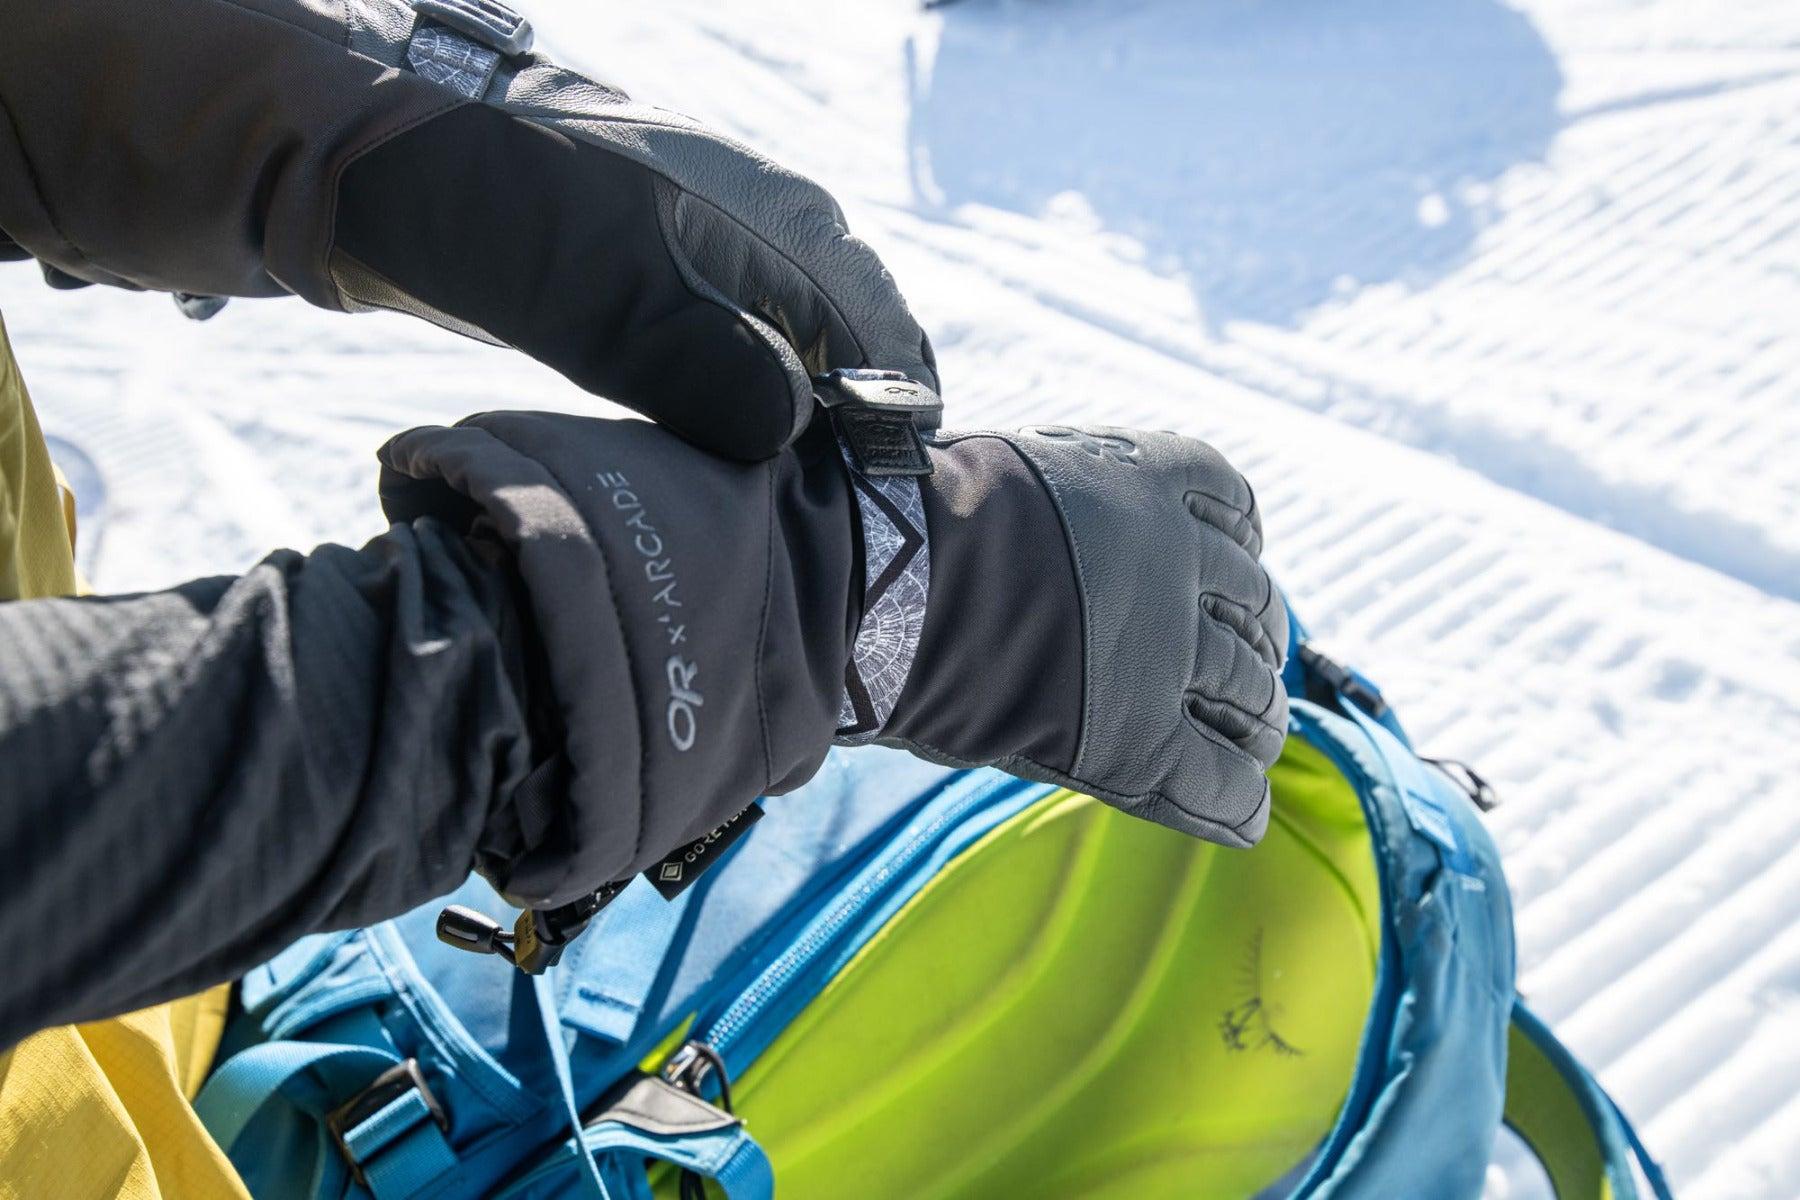 A skier wears the Carbide Sensor Gloves.